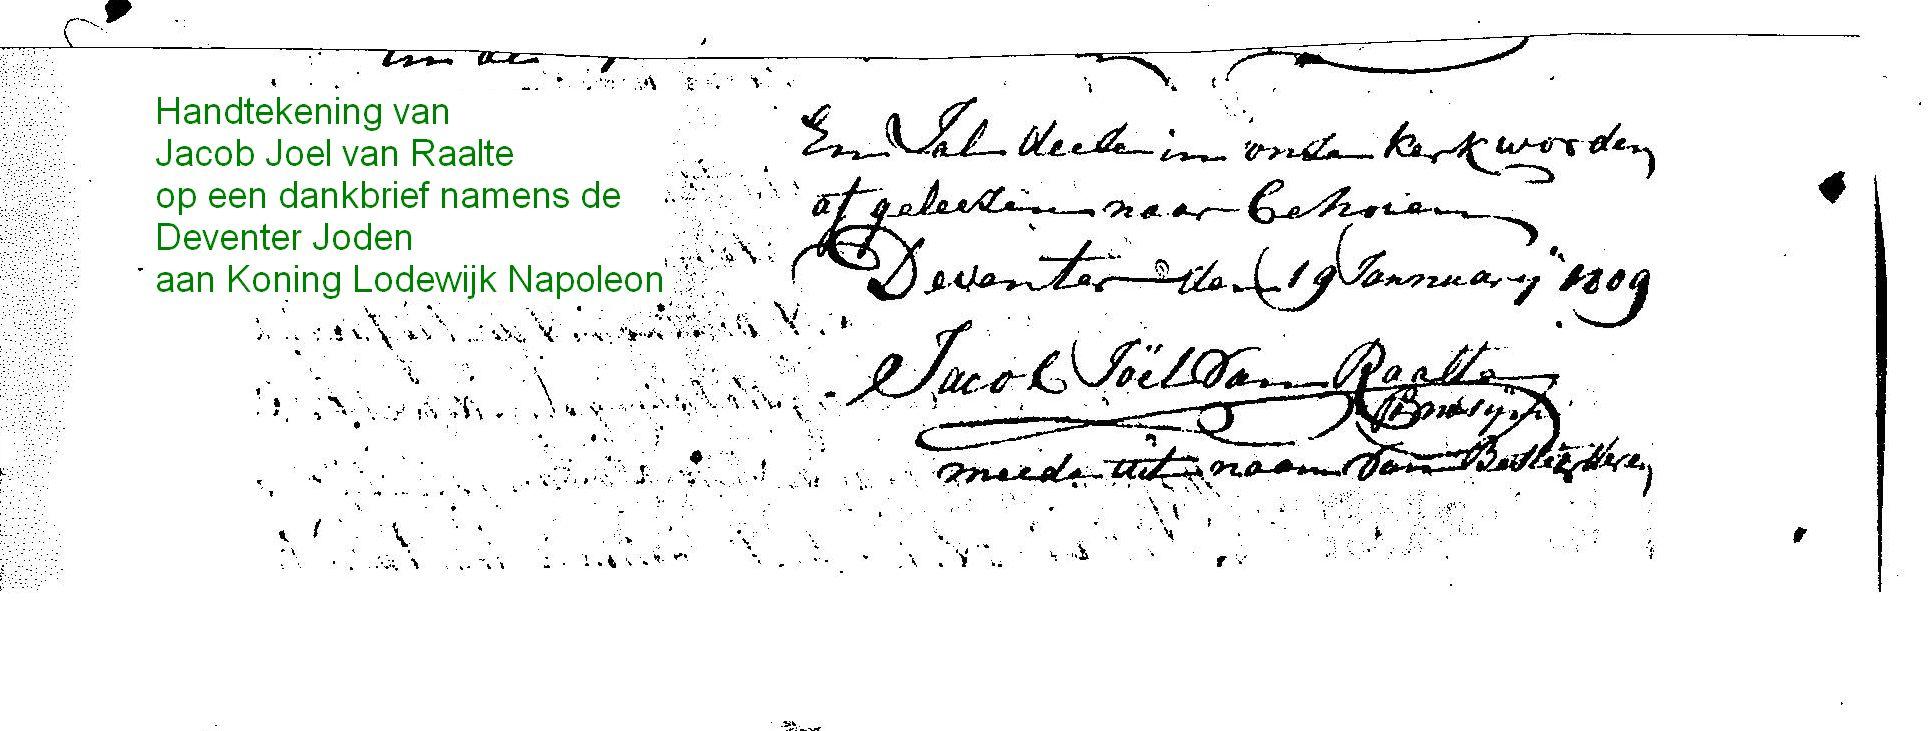 brief met handtekening